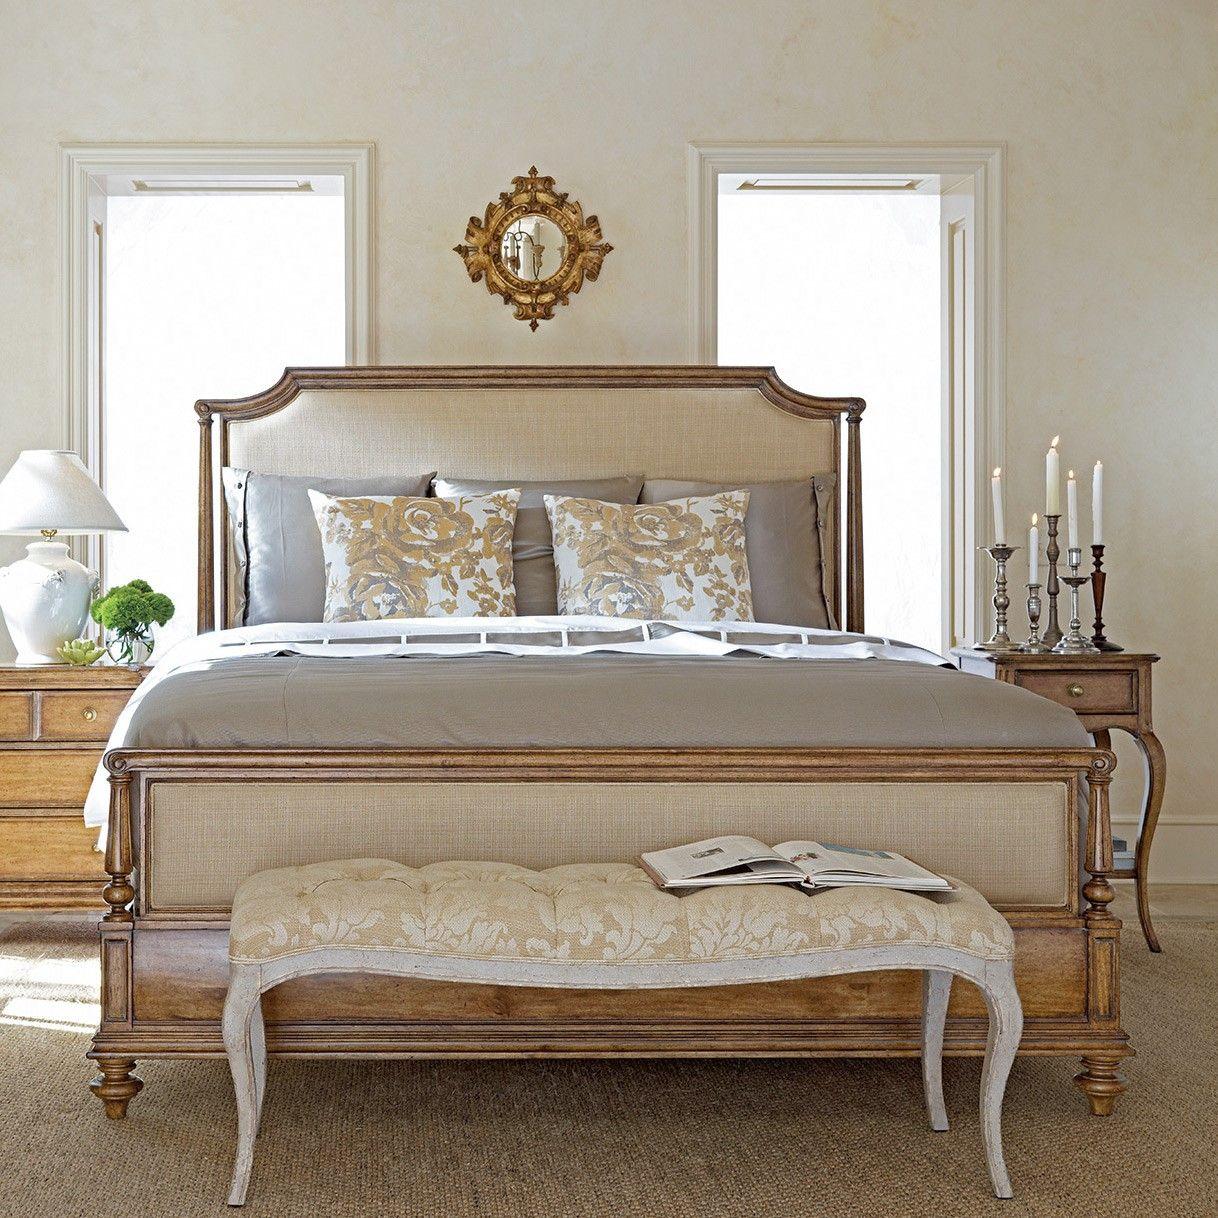 Stanley Furniture Arrondissement Palais Sunlight Anigre Bed